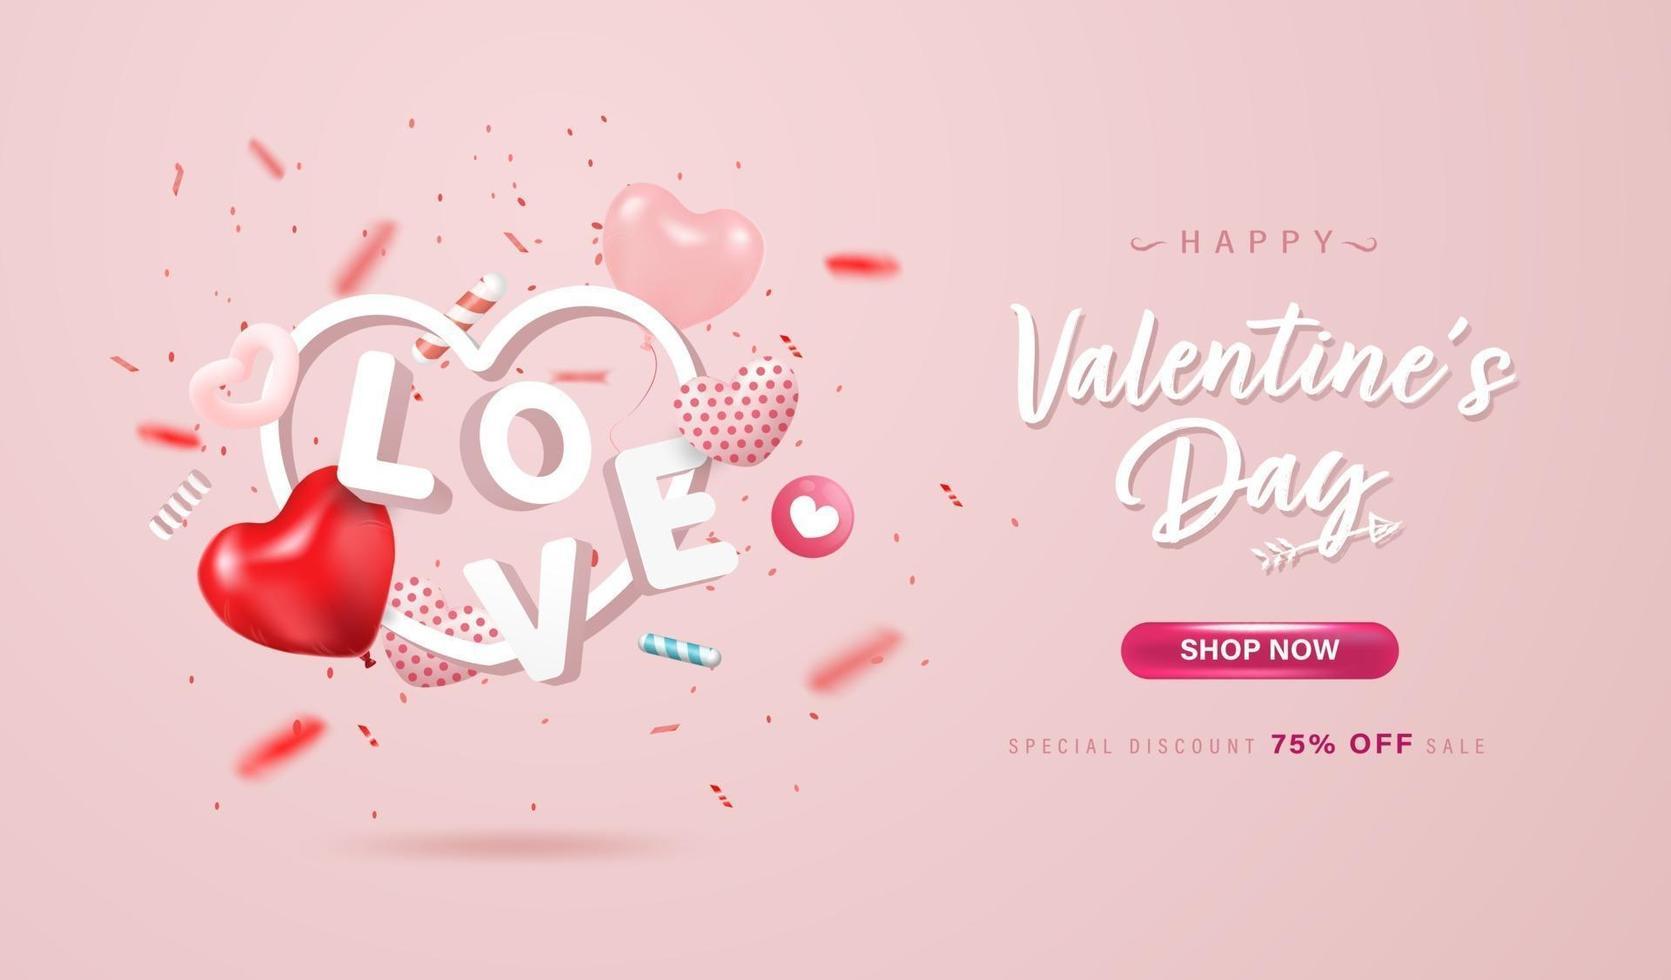 Happy Valentine's Day online shopping banner or background design vector